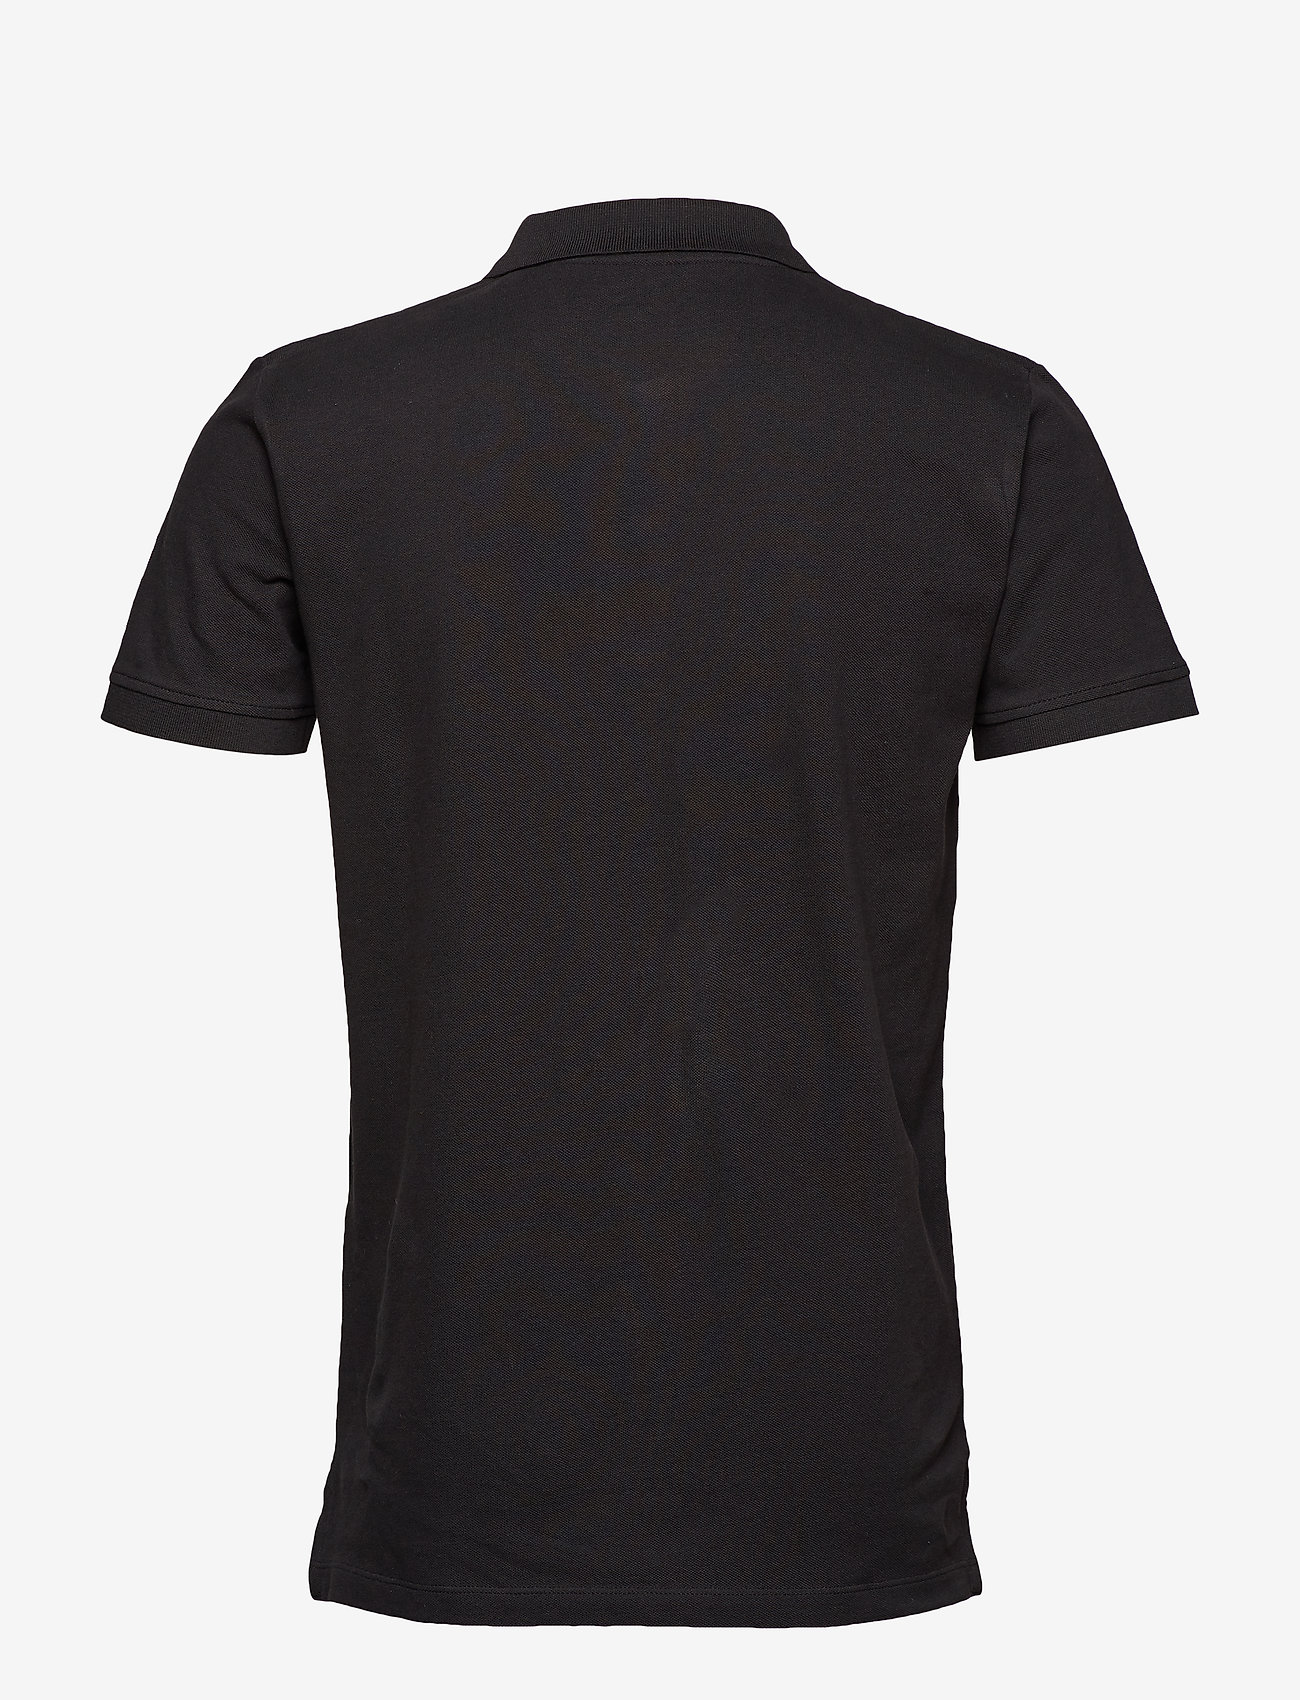 Polo Shirts (Black) - Esprit Casual dZ6EFz